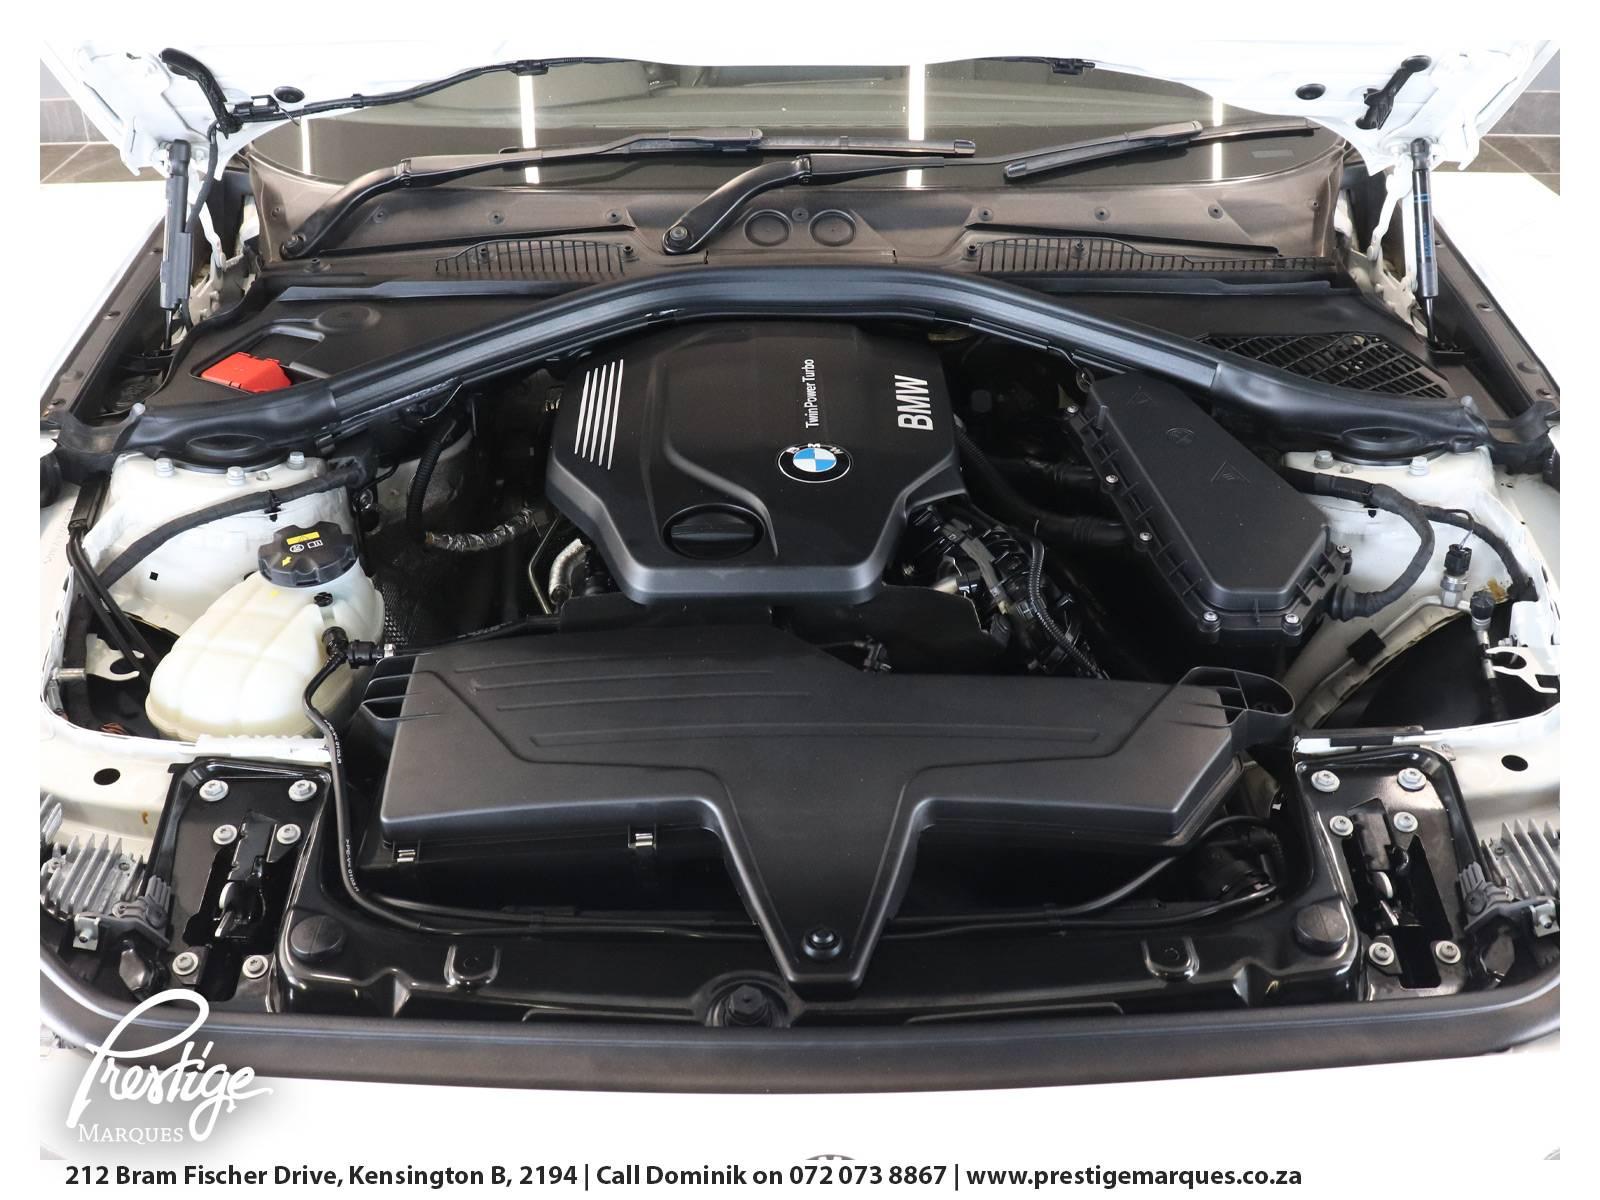 2015_BMW-2 series-220d-Prestige-Marques-Randburg-Sandton-8